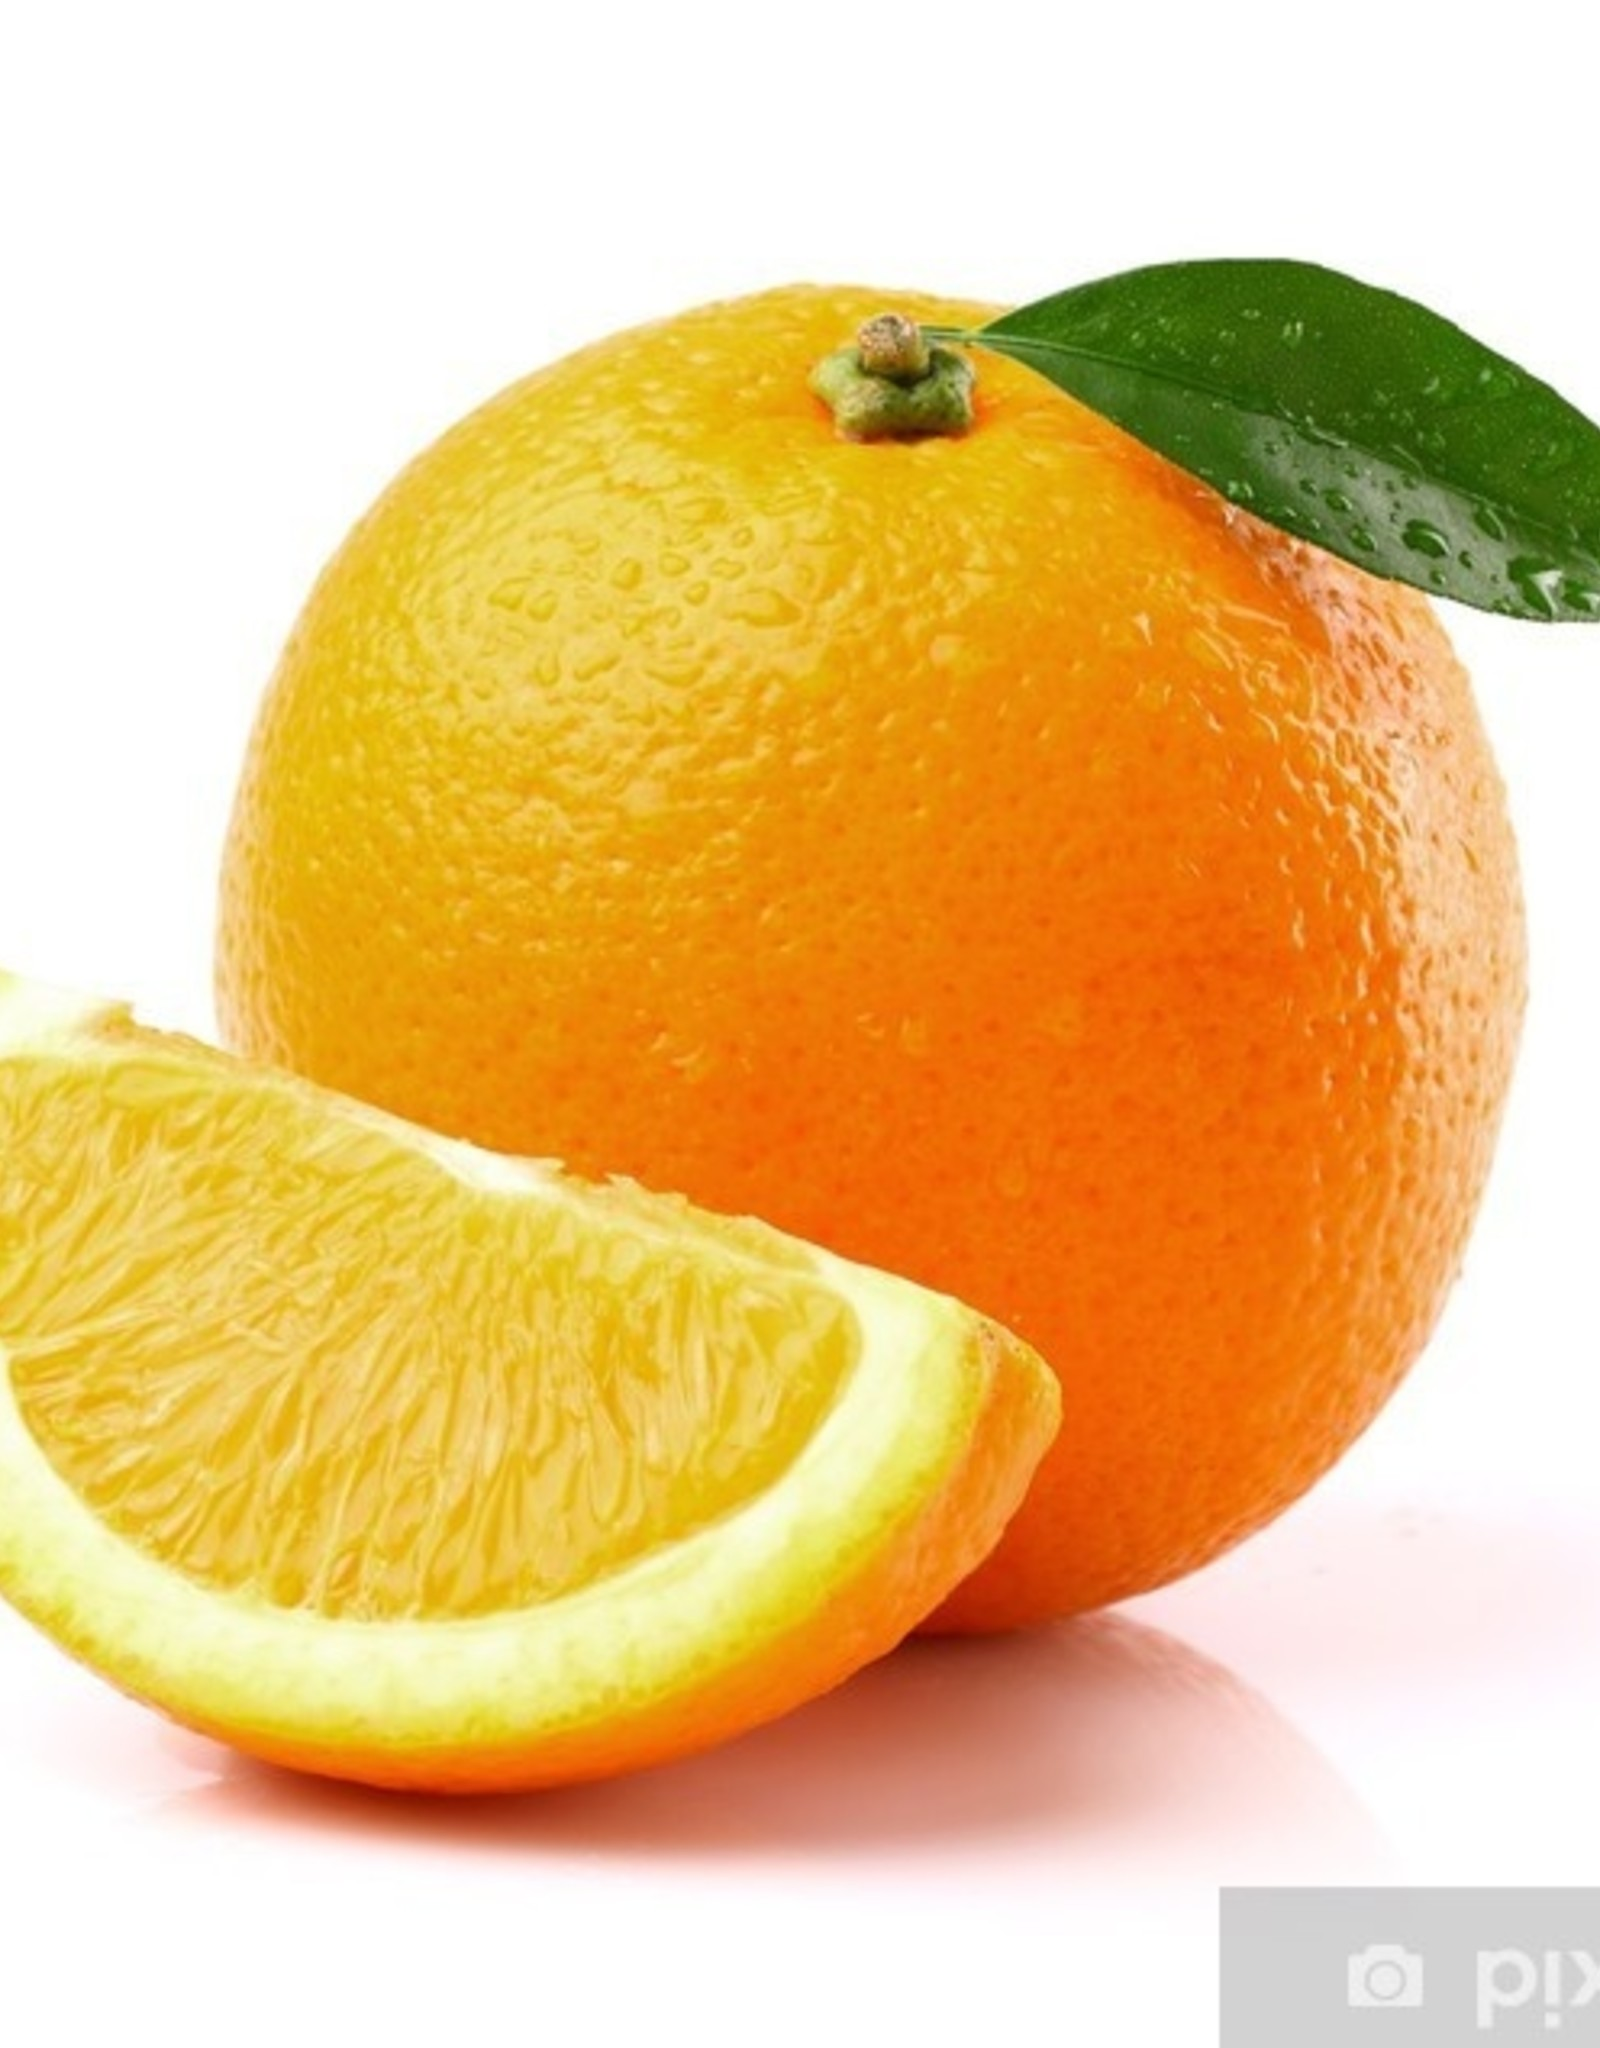 TALYA Talya Sinaasappelolie Essentiële Olie 20 ml